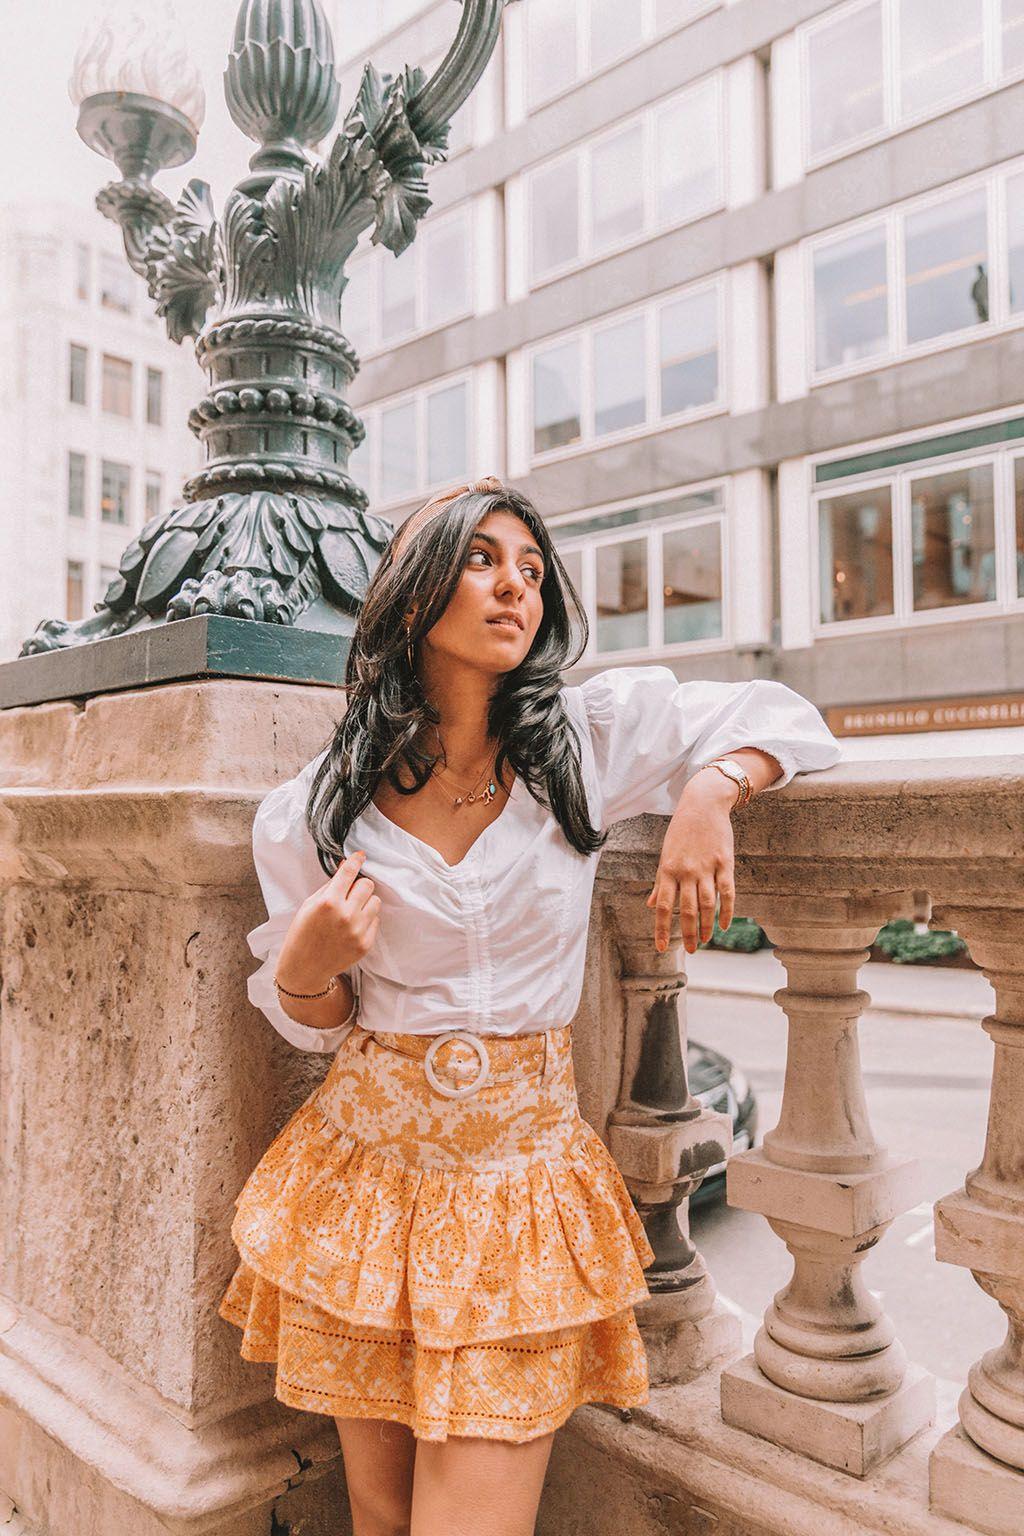 8a93ce9ae Luxury fashion blogger Shloka Narang of The Silk Sneaker shares how to  create a cute and